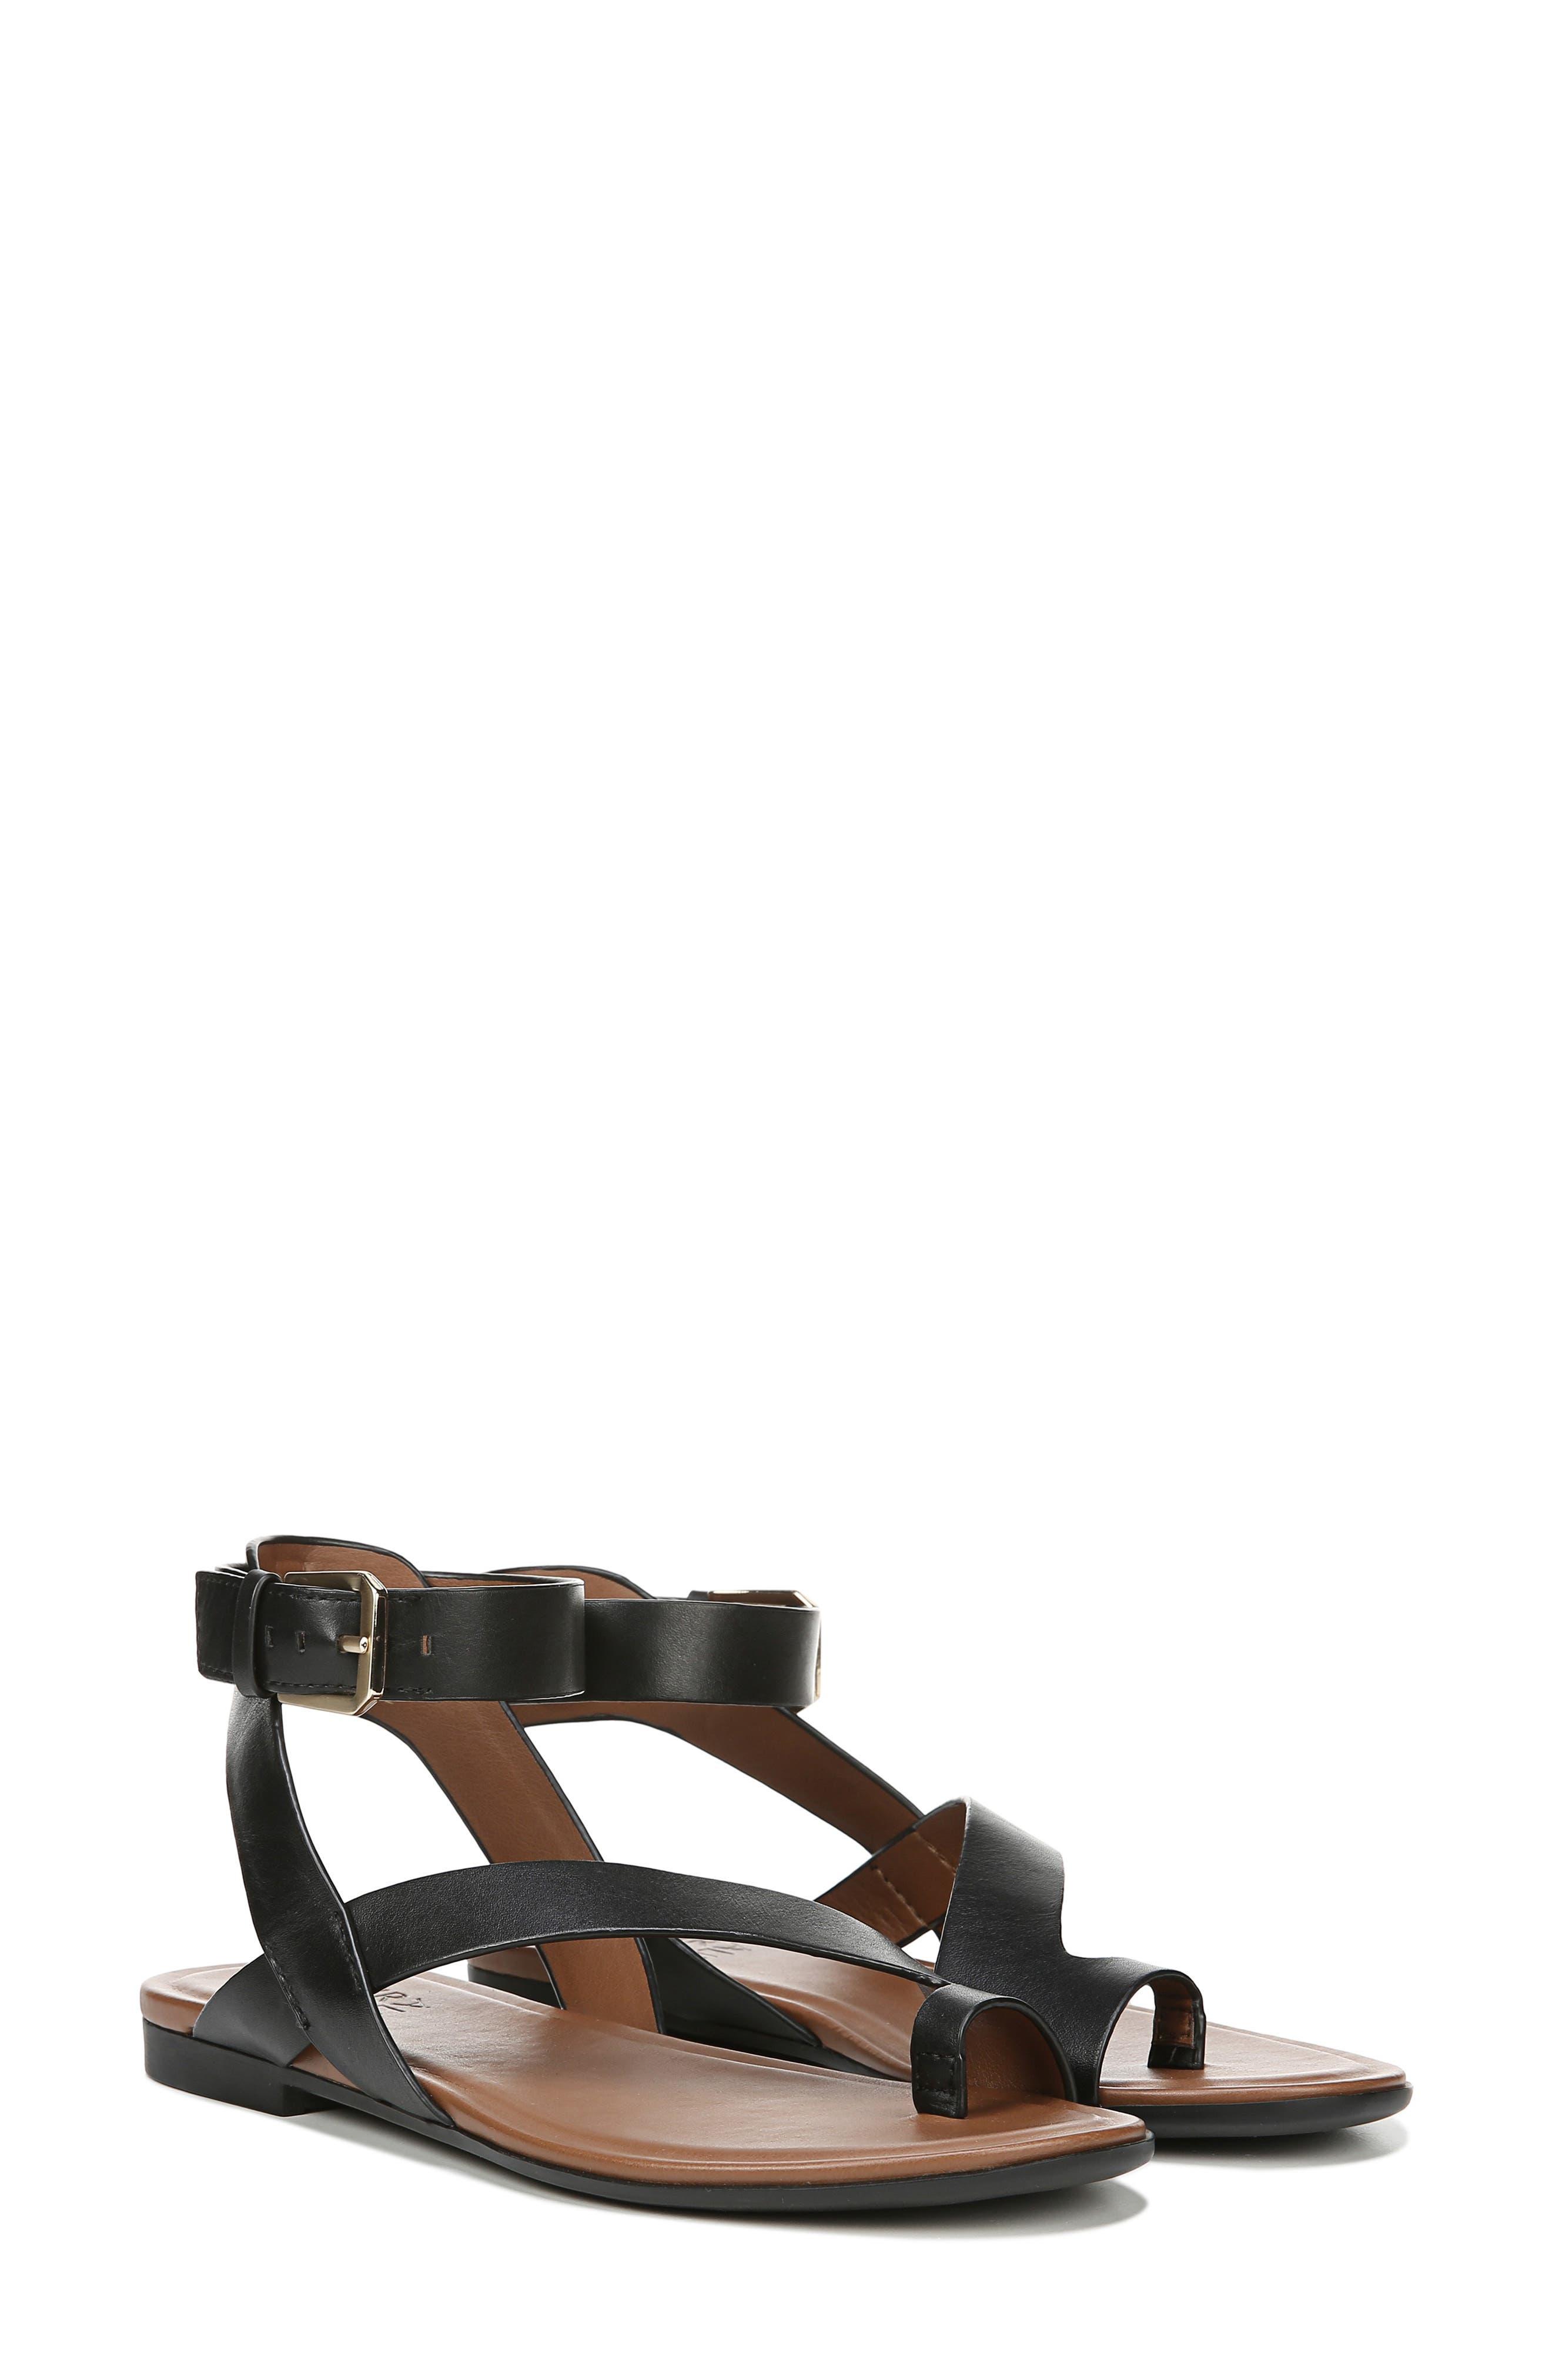 Tally Ankle Strap Sandal,                             Alternate thumbnail 8, color,                             BLACK LEATHER